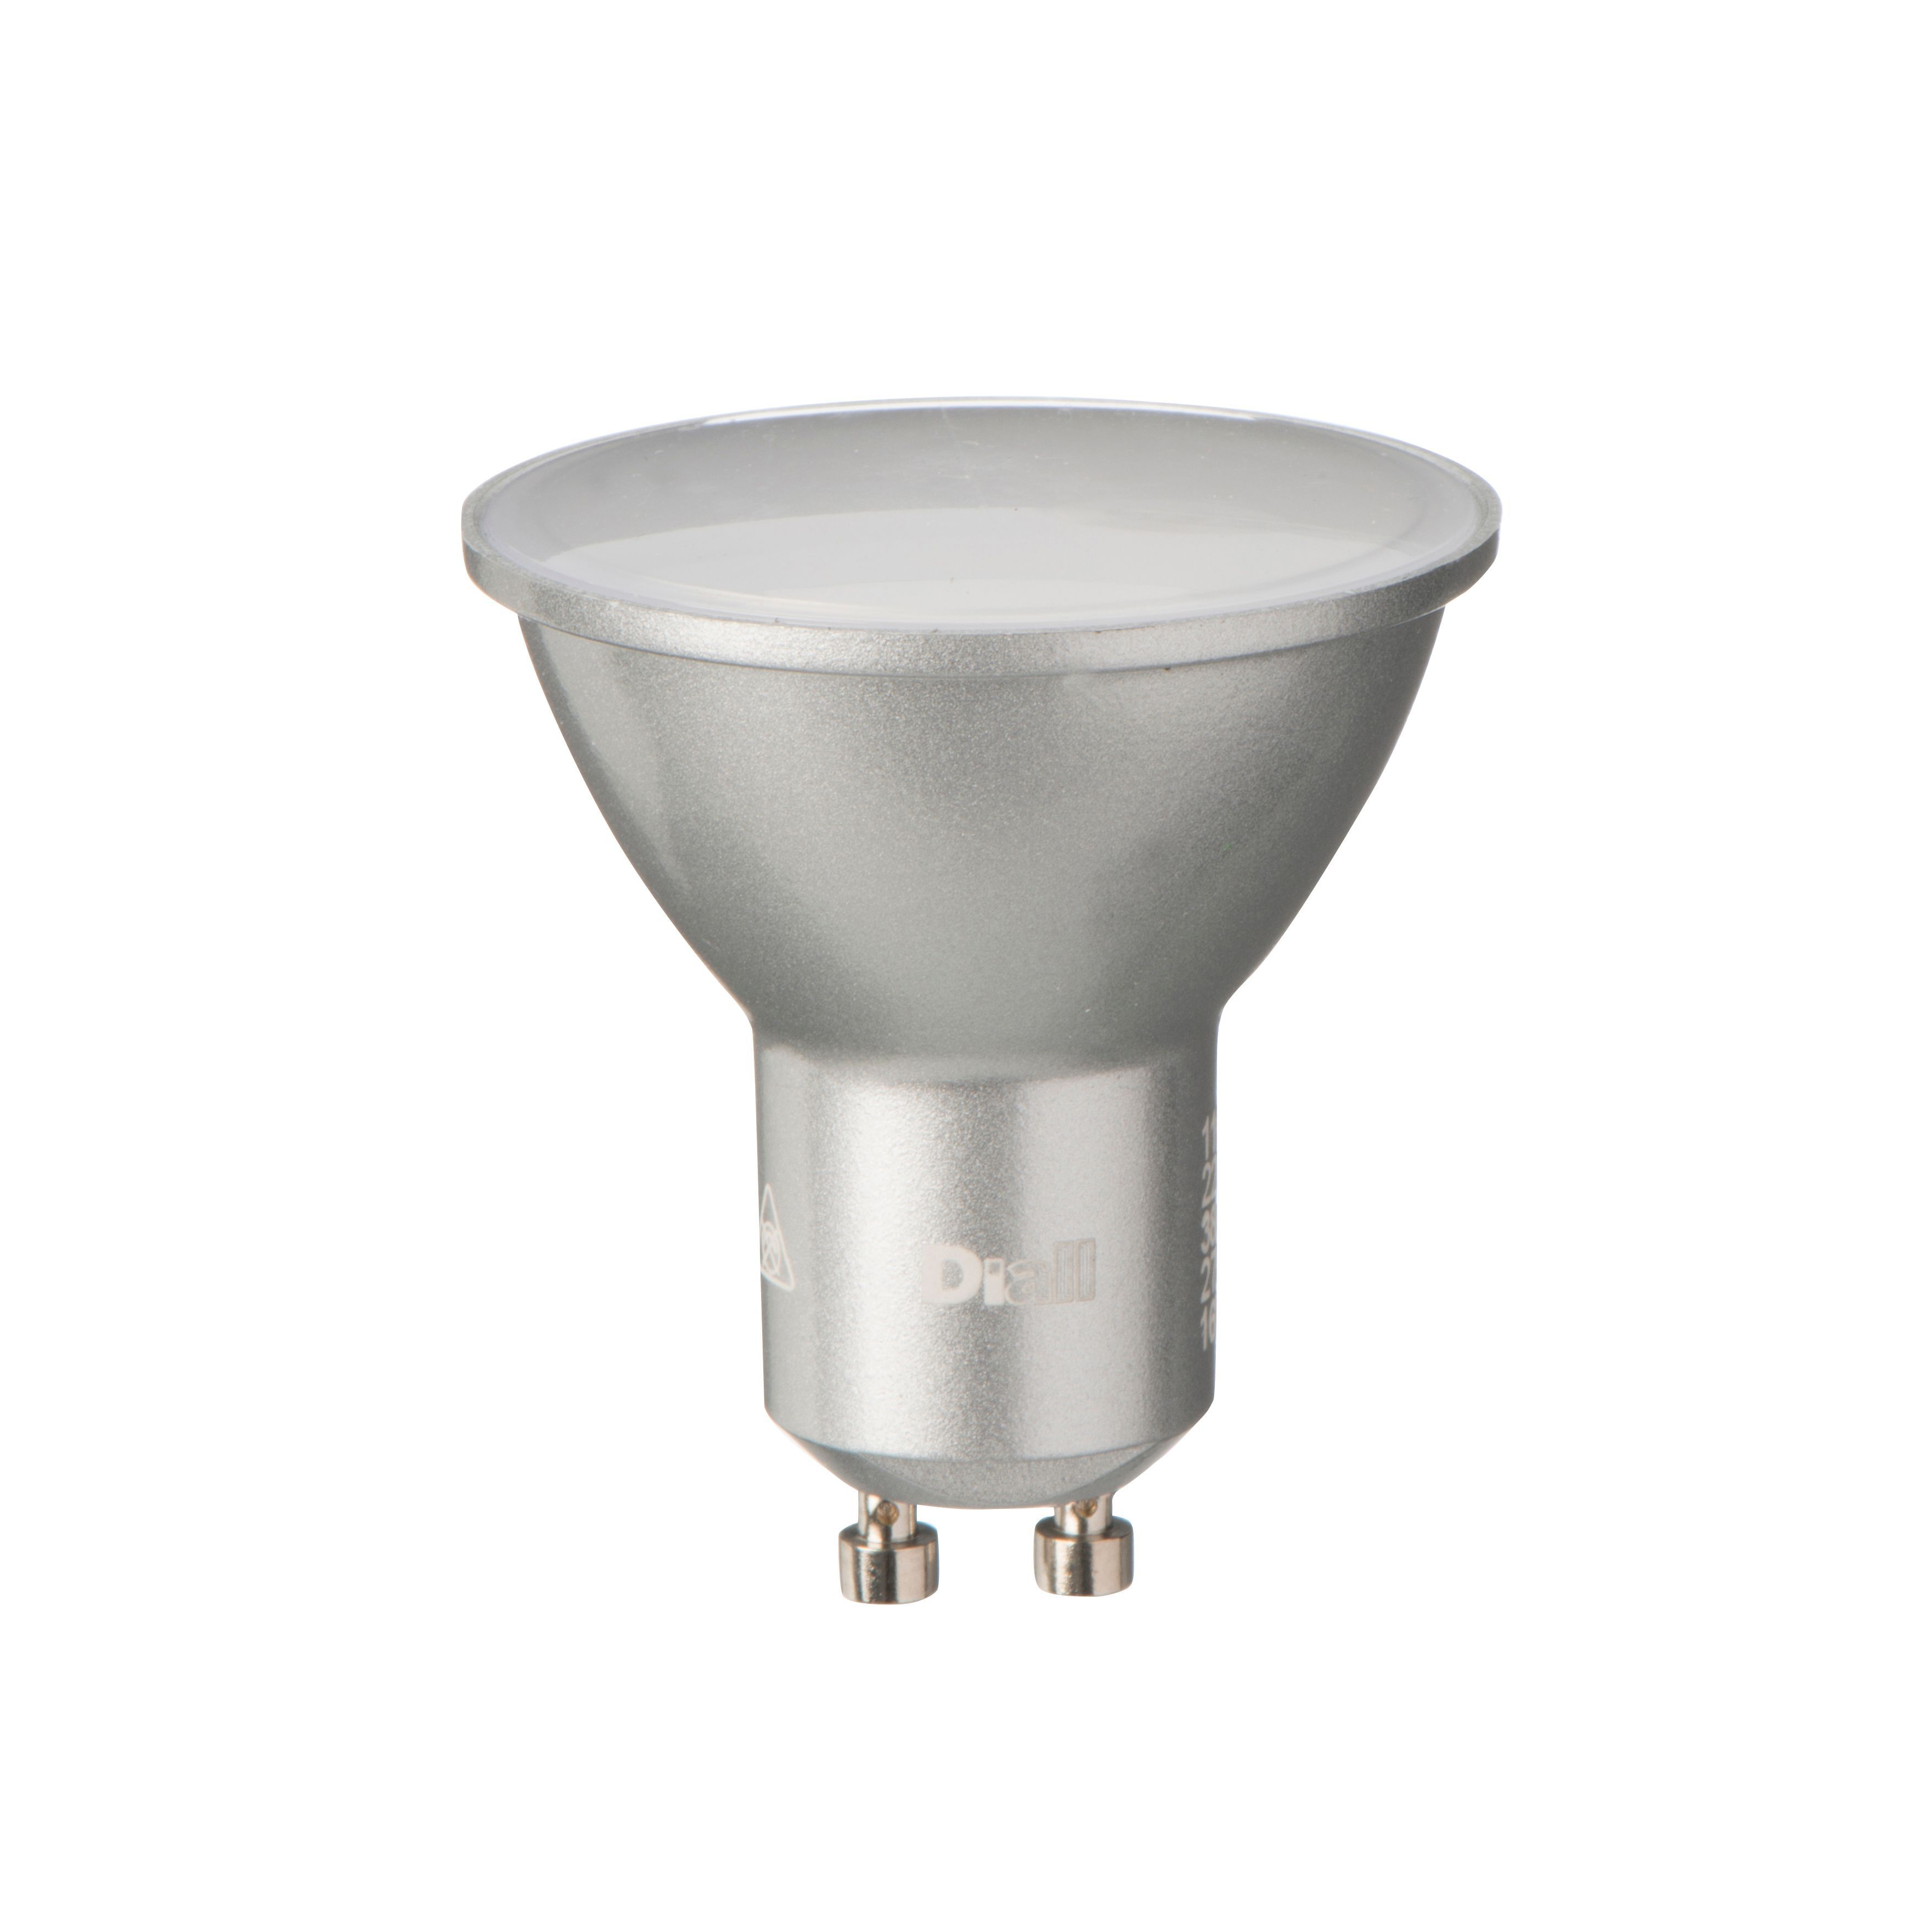 Diall Gu10 340lm Led Reflector Light Bulb